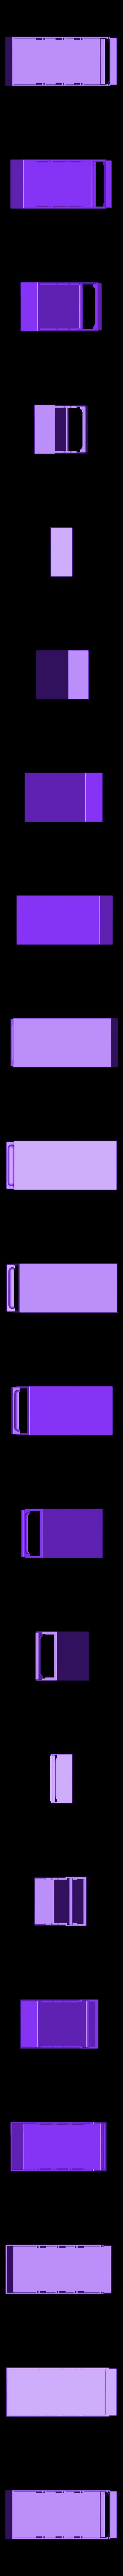 Ytiroir15cmx7-1bMOD__repaired_.stl Download free STL file Replacement Drawer - 7 x 15 cm - Tiroir de rechange • 3D printing design, Shapescribe